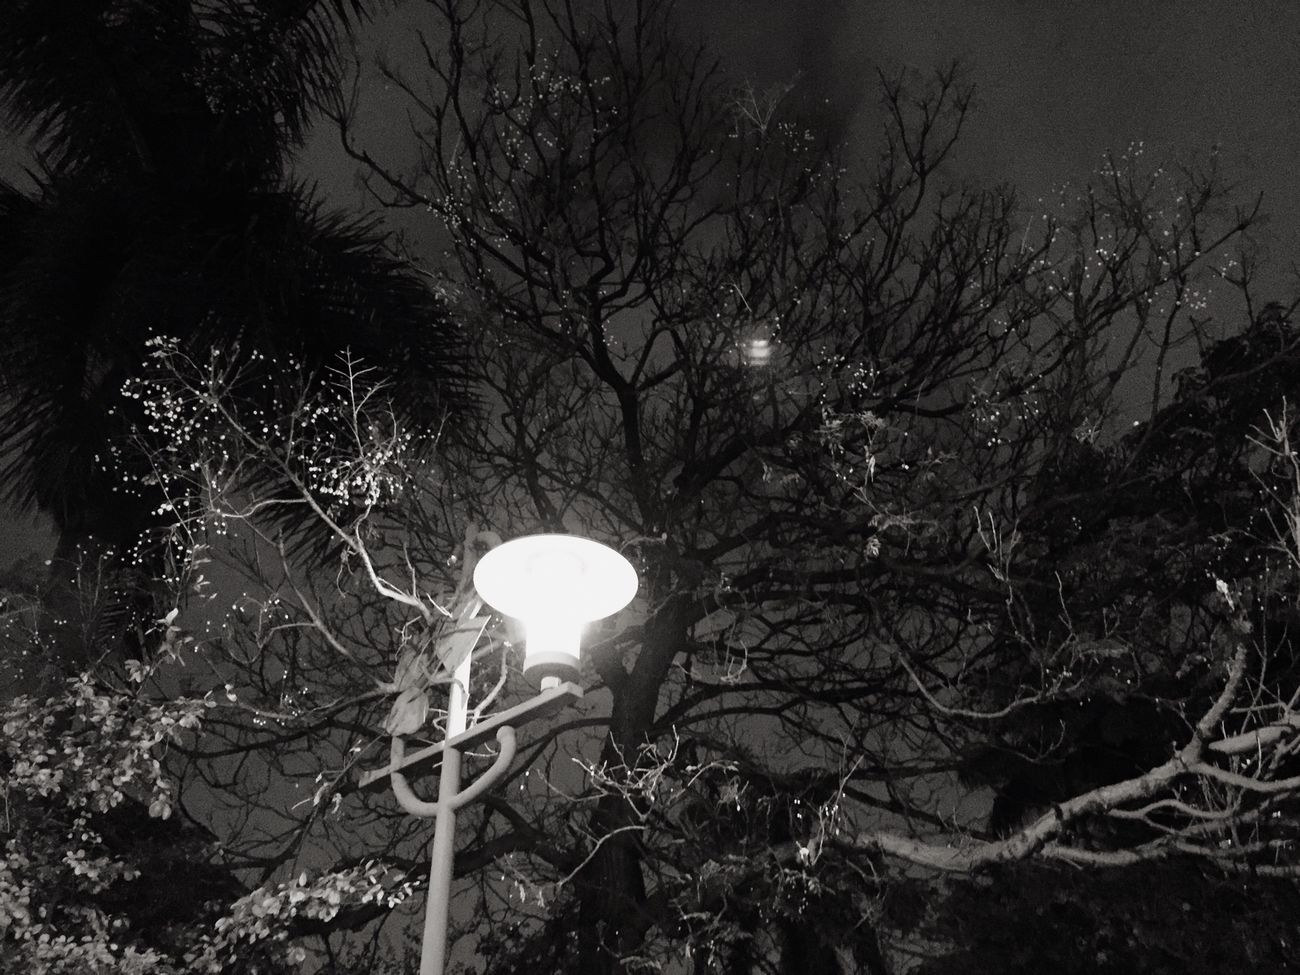 Night Lights Enjoying Life Trtraving Relaxing